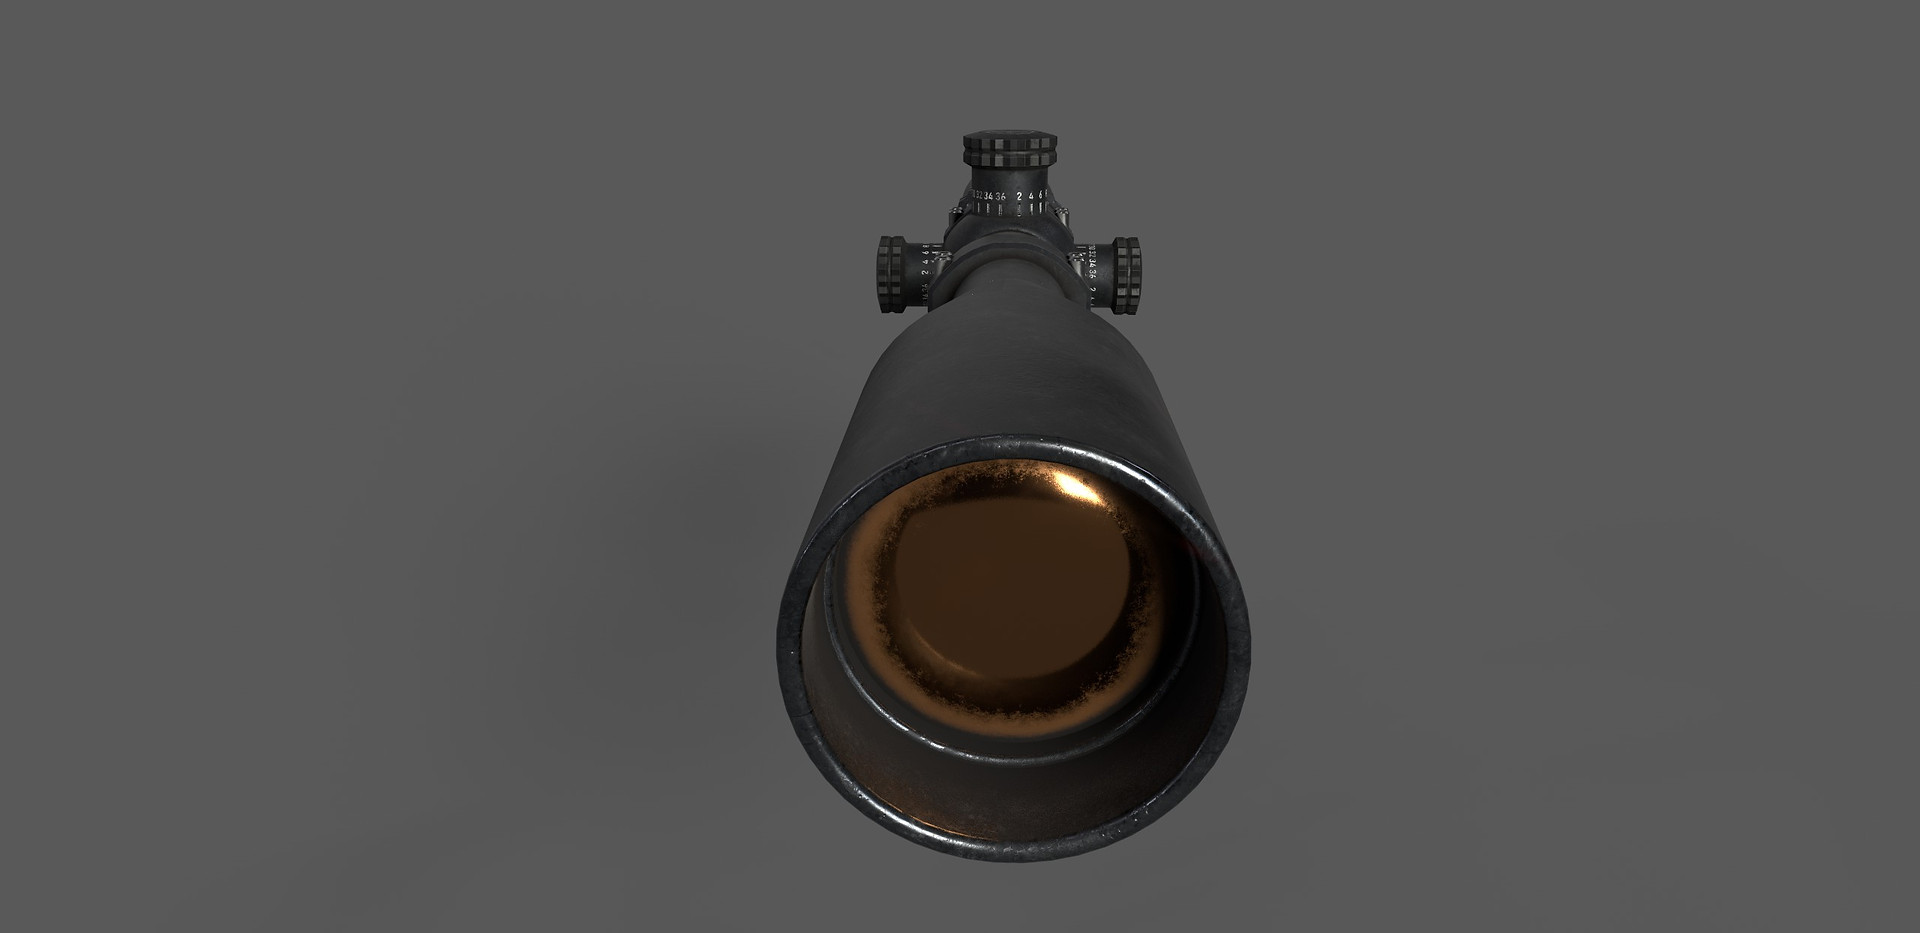 RifleScope_Front.jpg